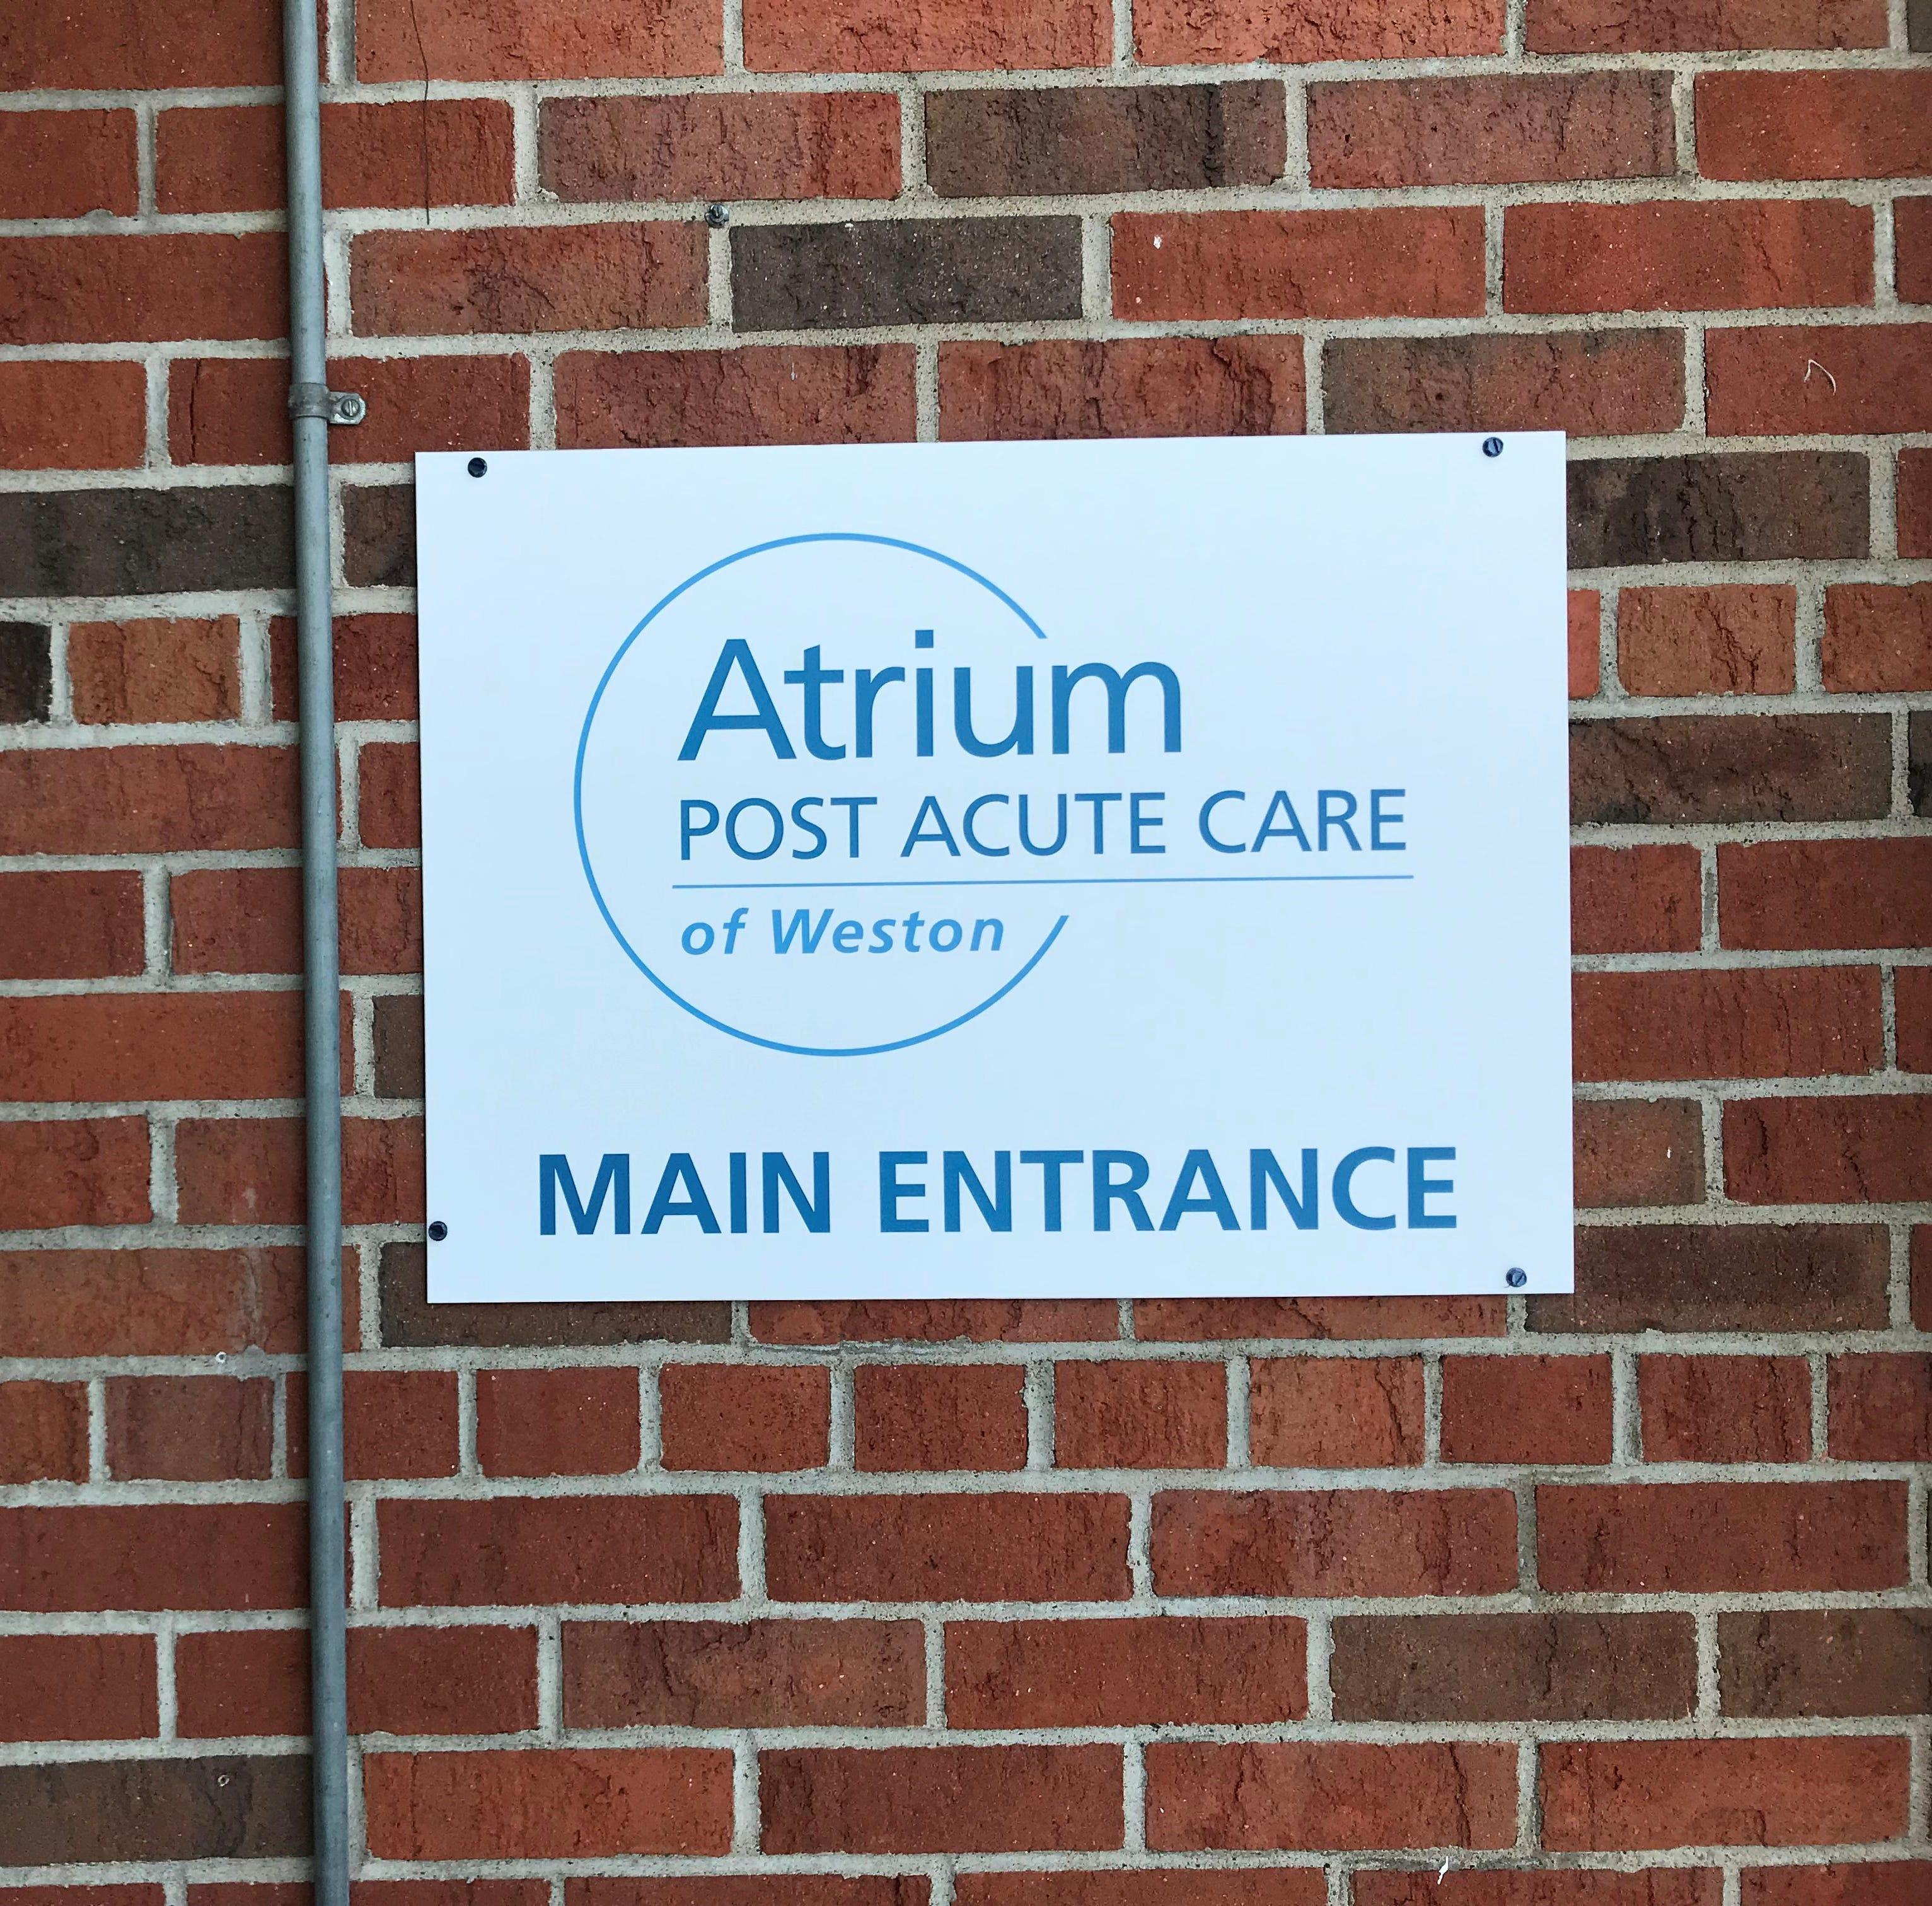 Atrium home operators arranged to protect seniors, then disregarded plans